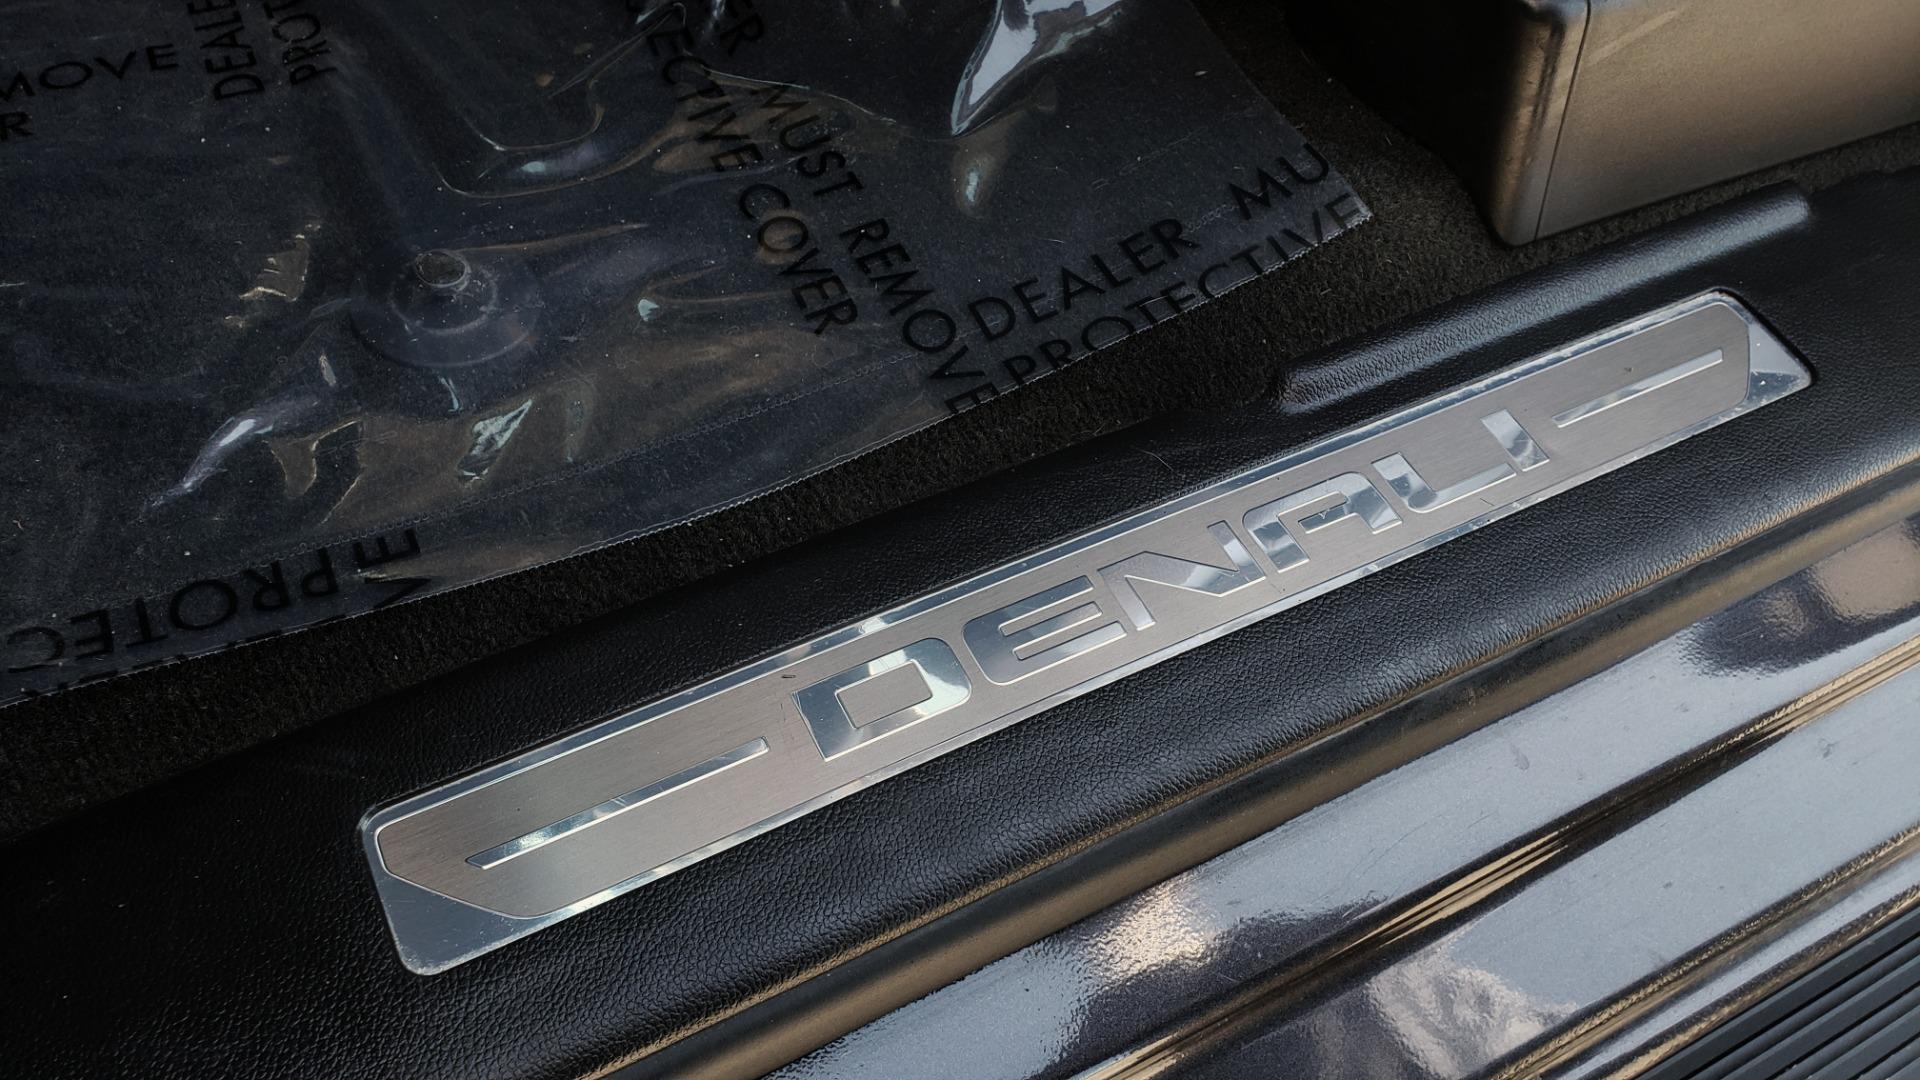 Used 2015 GMC SIERRA 2500HD DENALI 4WD CREWCAB / 6.6L DURAMAX / 6-SPD AUTO / NAV / BOSE for sale $50,995 at Formula Imports in Charlotte NC 28227 43